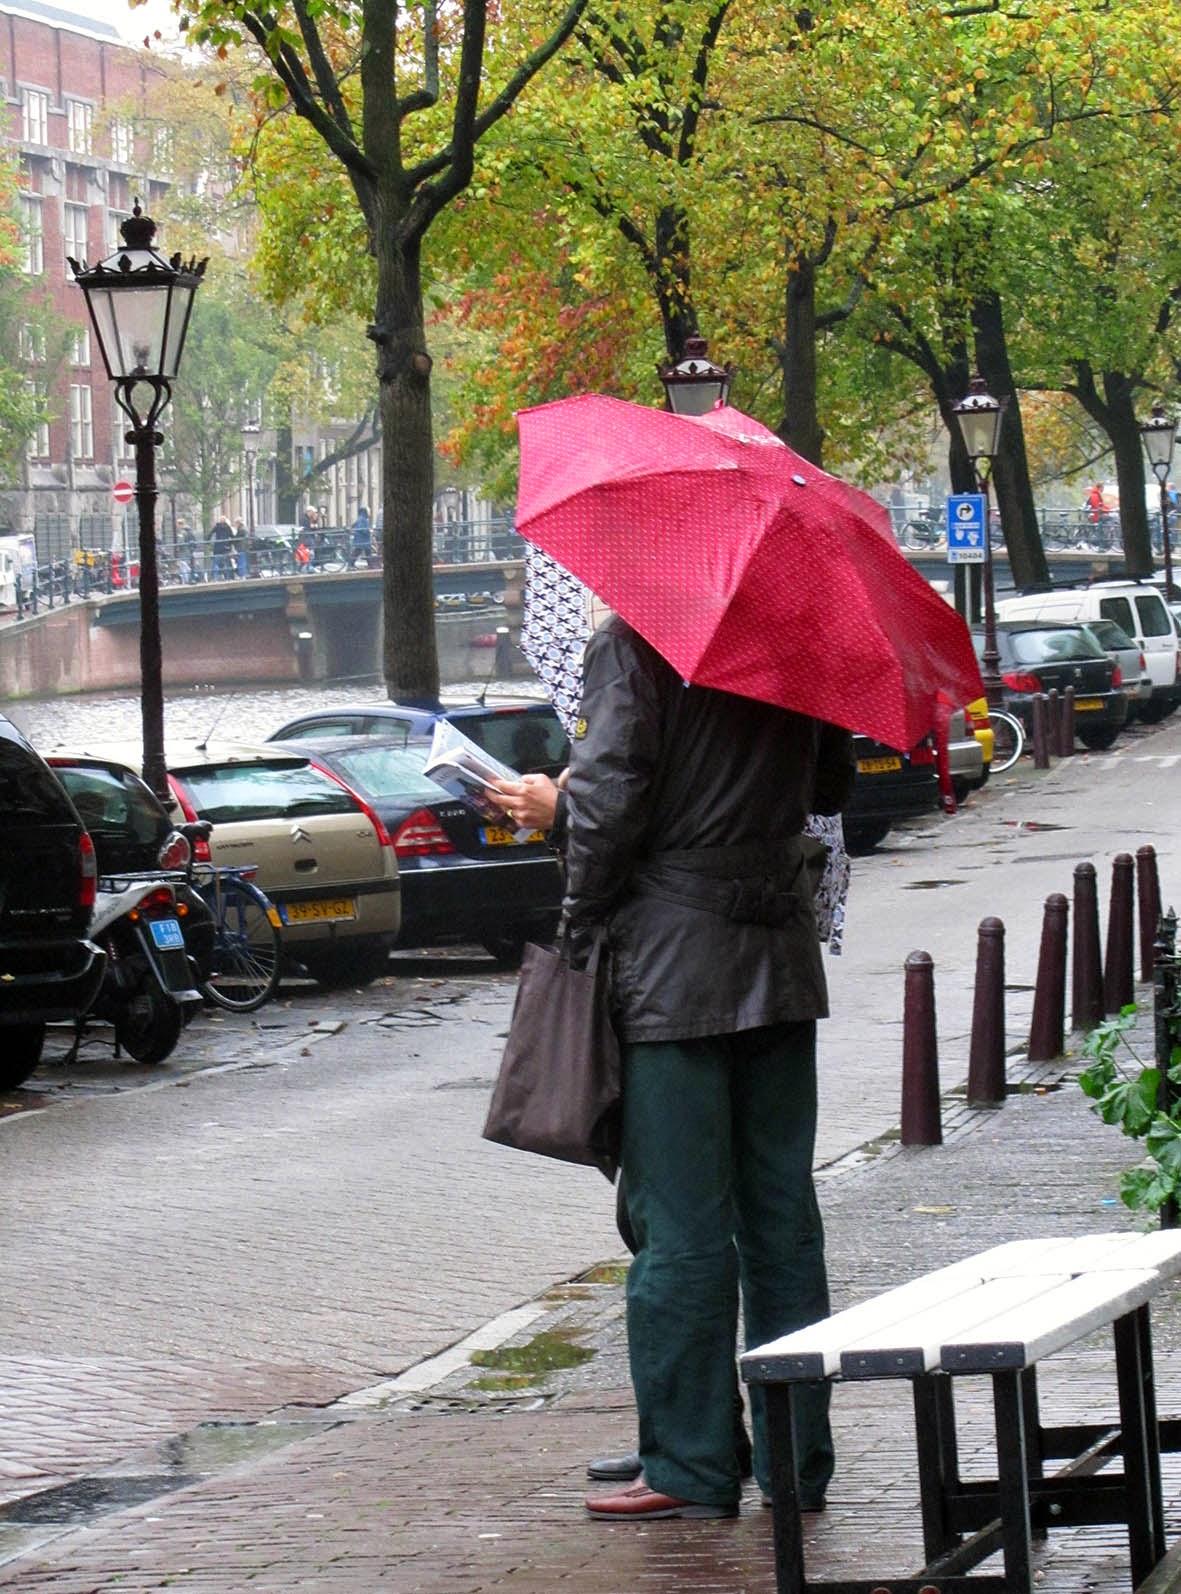 couple under a red umbrella